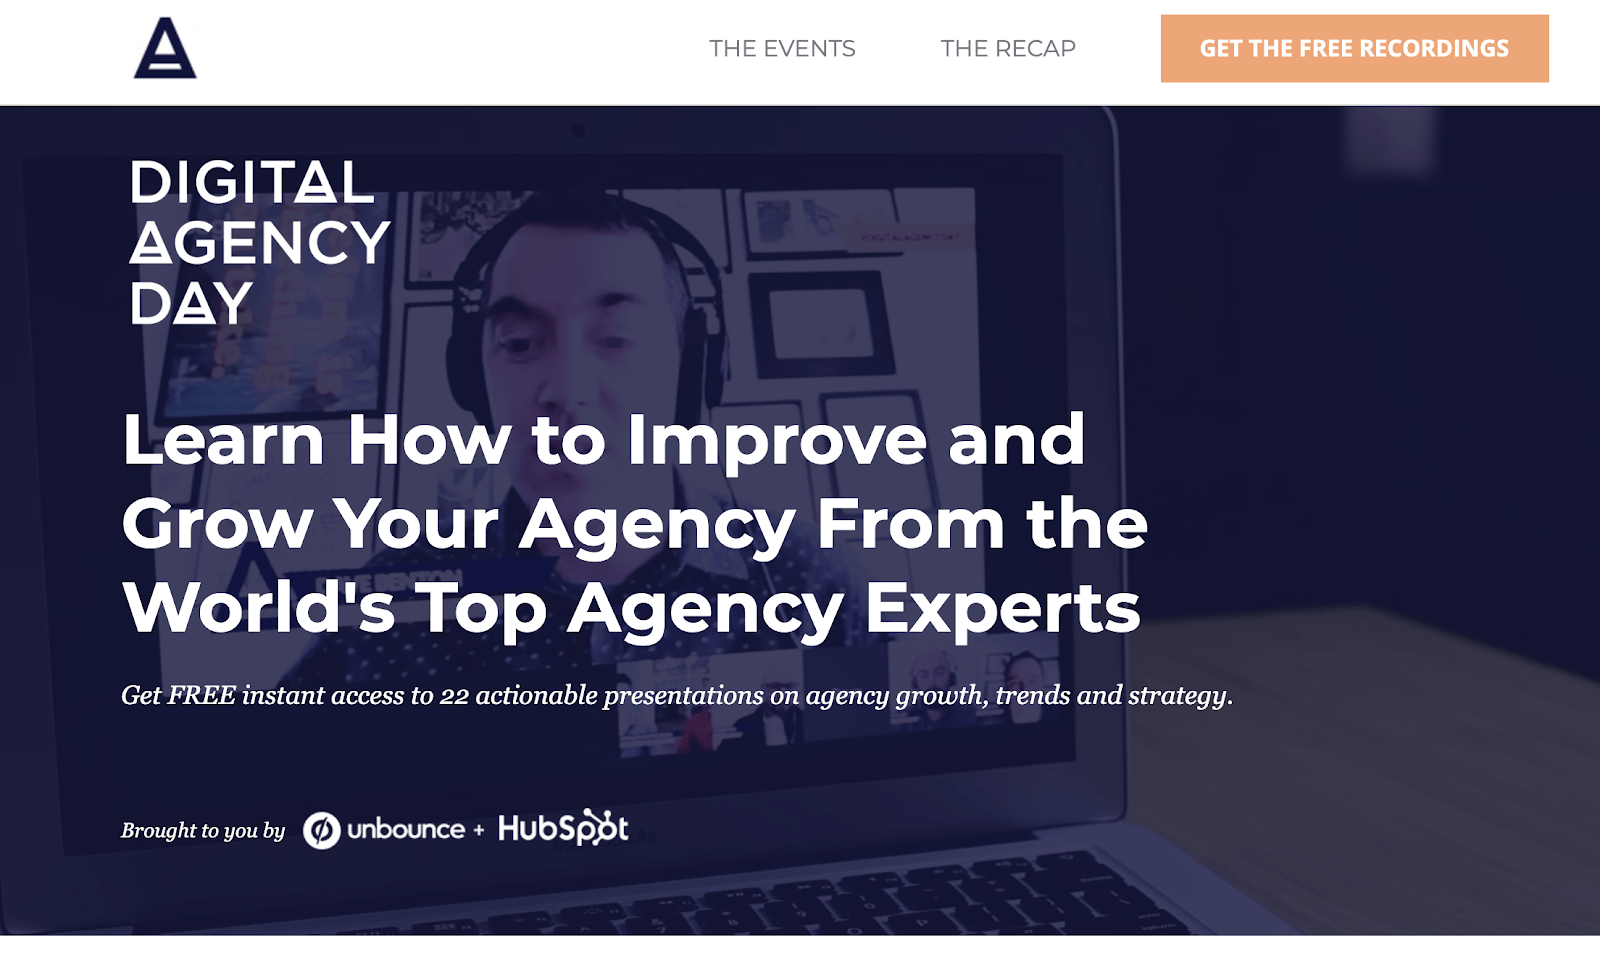 A webinar example by Unbounce: Digital Agency Day